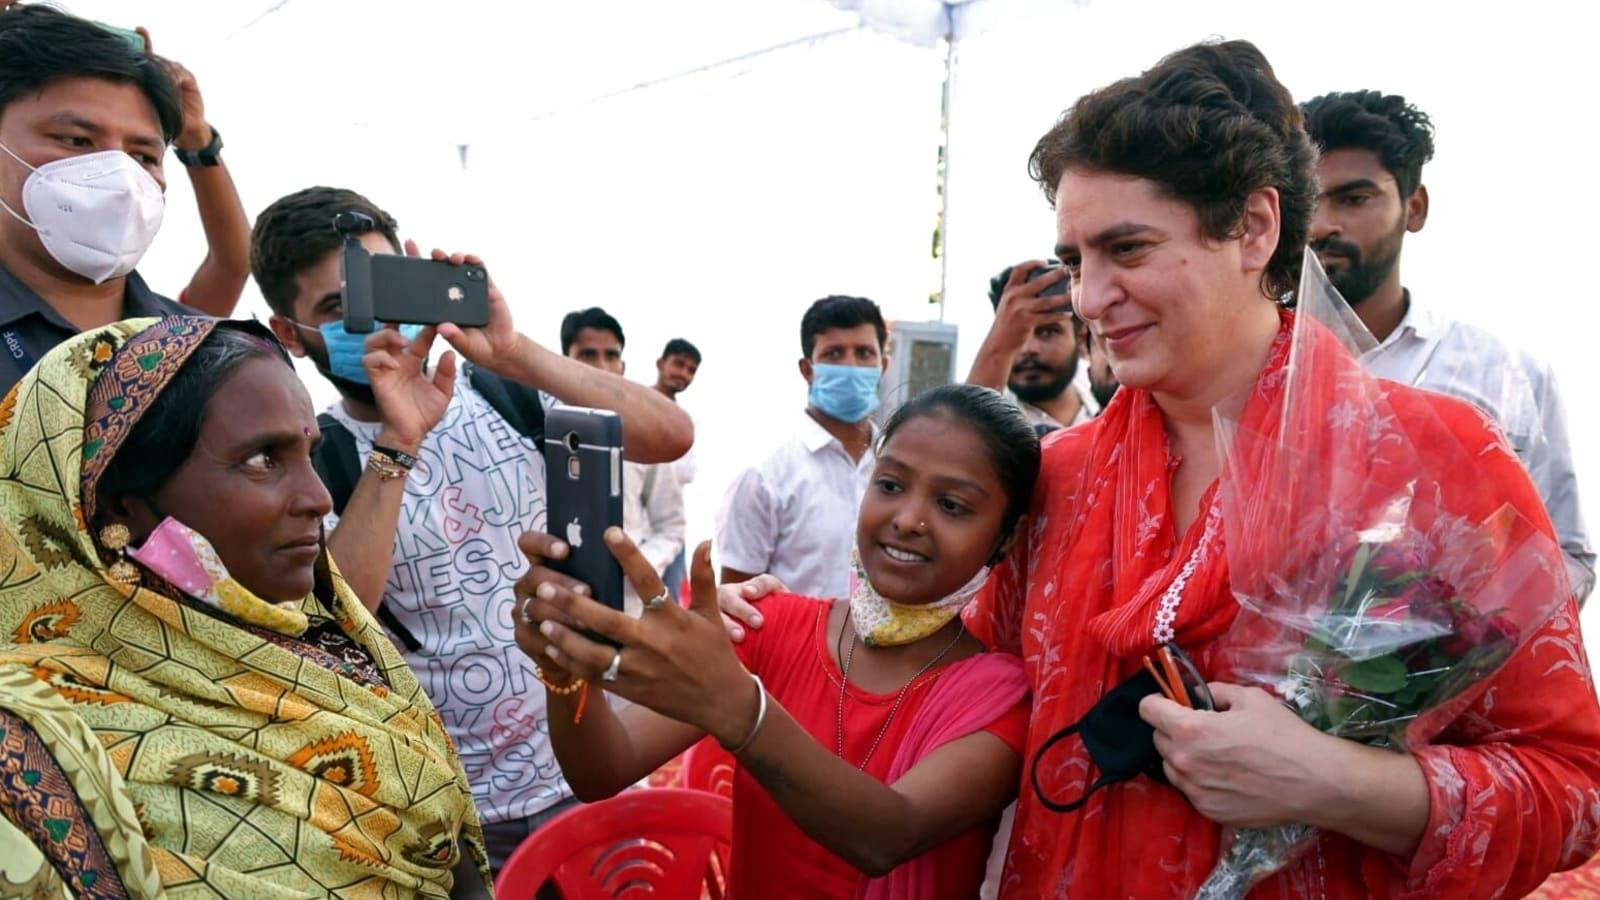 Will Priyanka Gandhi be UP CM candidate?: Up to her, says Salman Khurshid